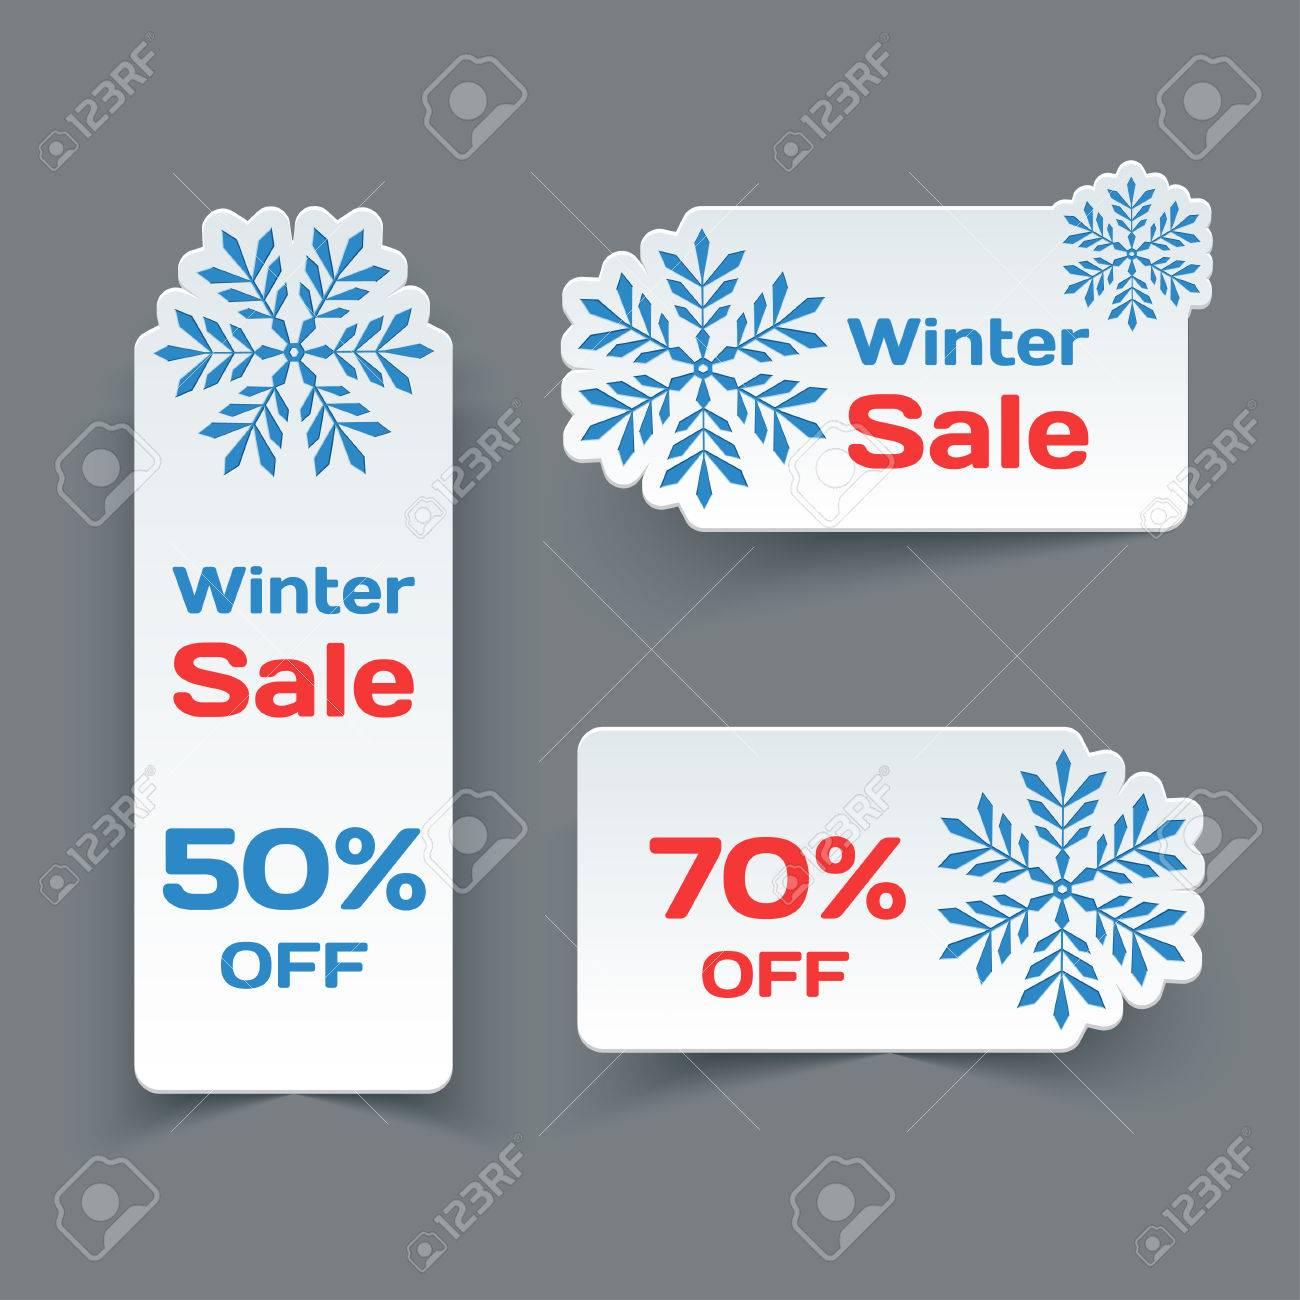 Winter Sale Banners Worldwide Banners